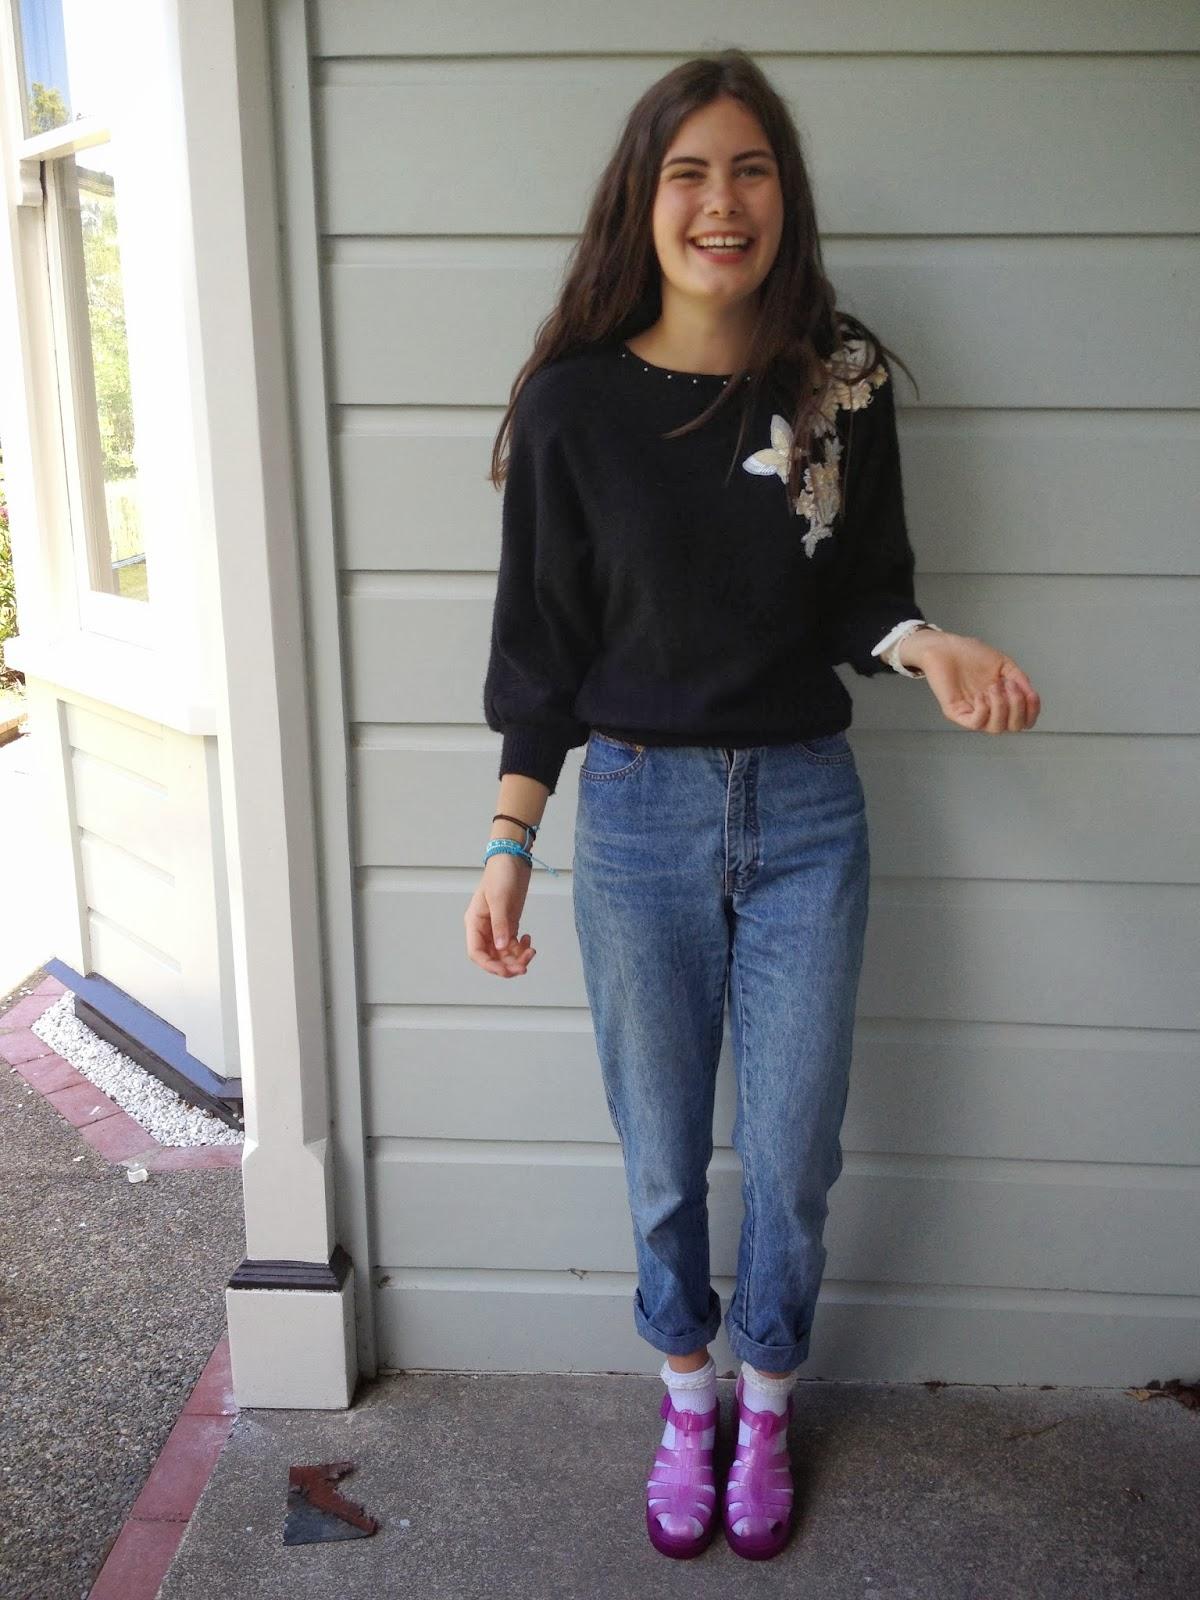 lol's blog: 3 ways to style boyfriend jeans